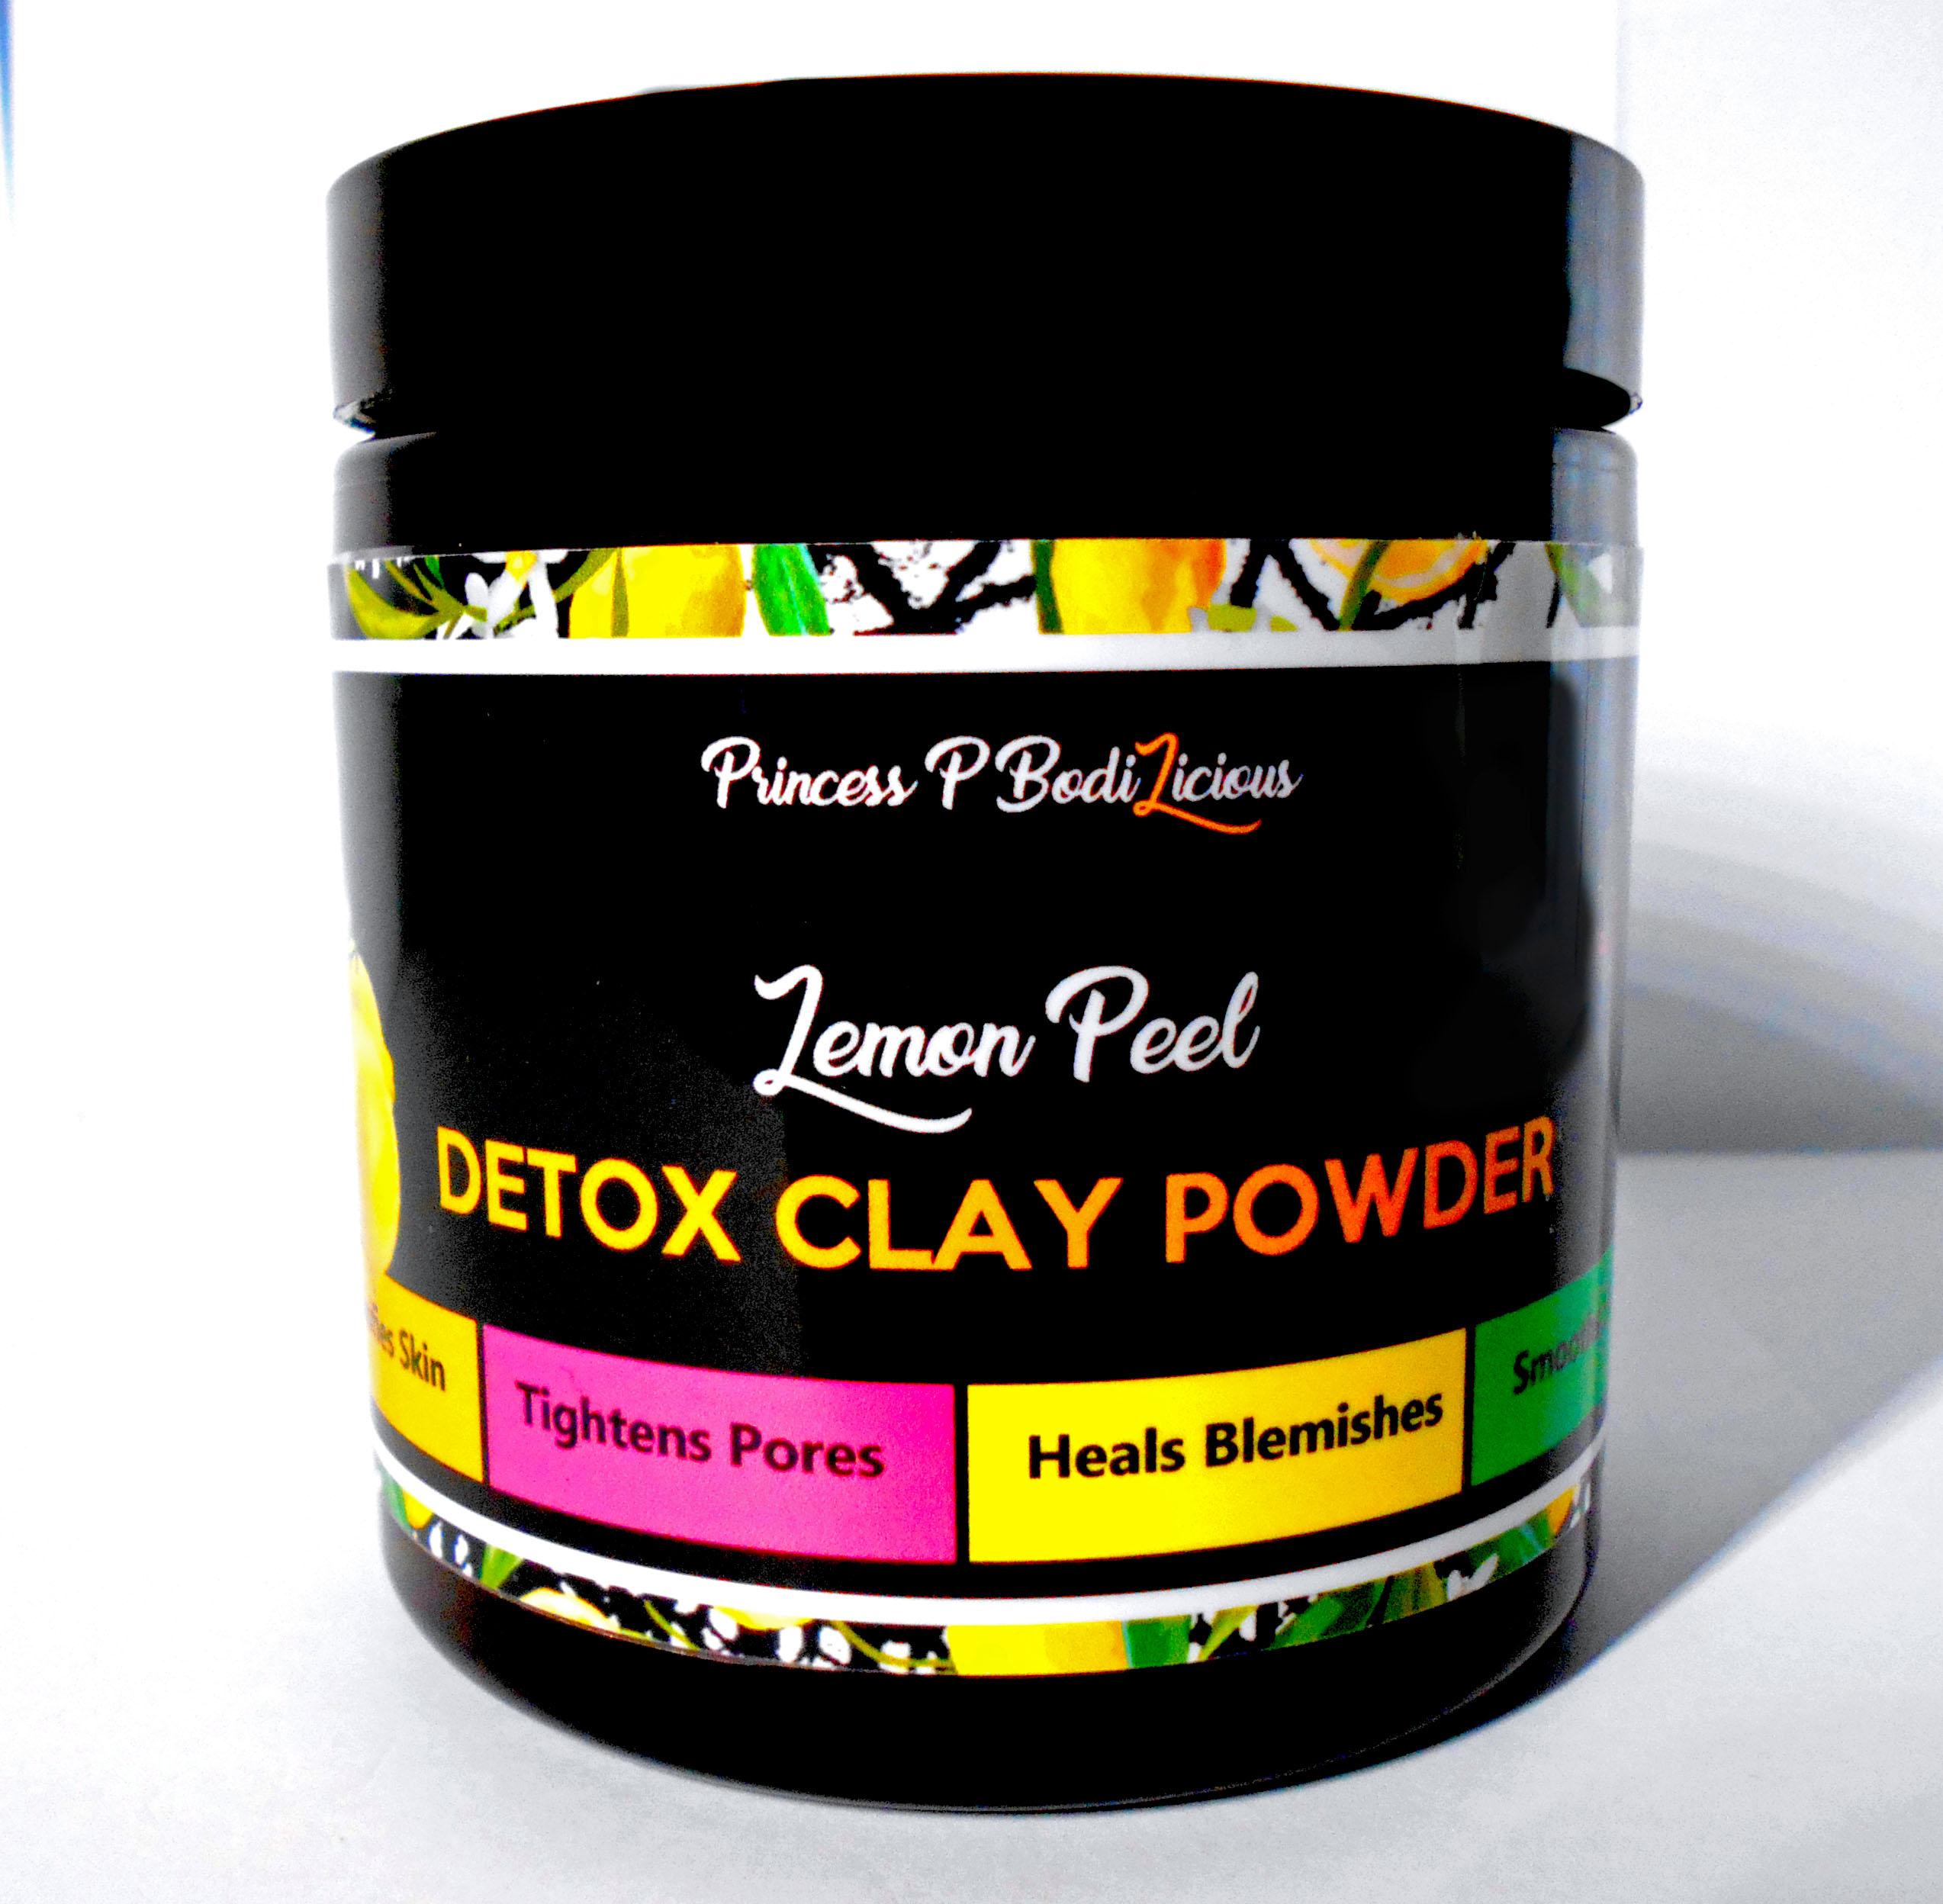 Detox Clay Powder -Lemon Peel